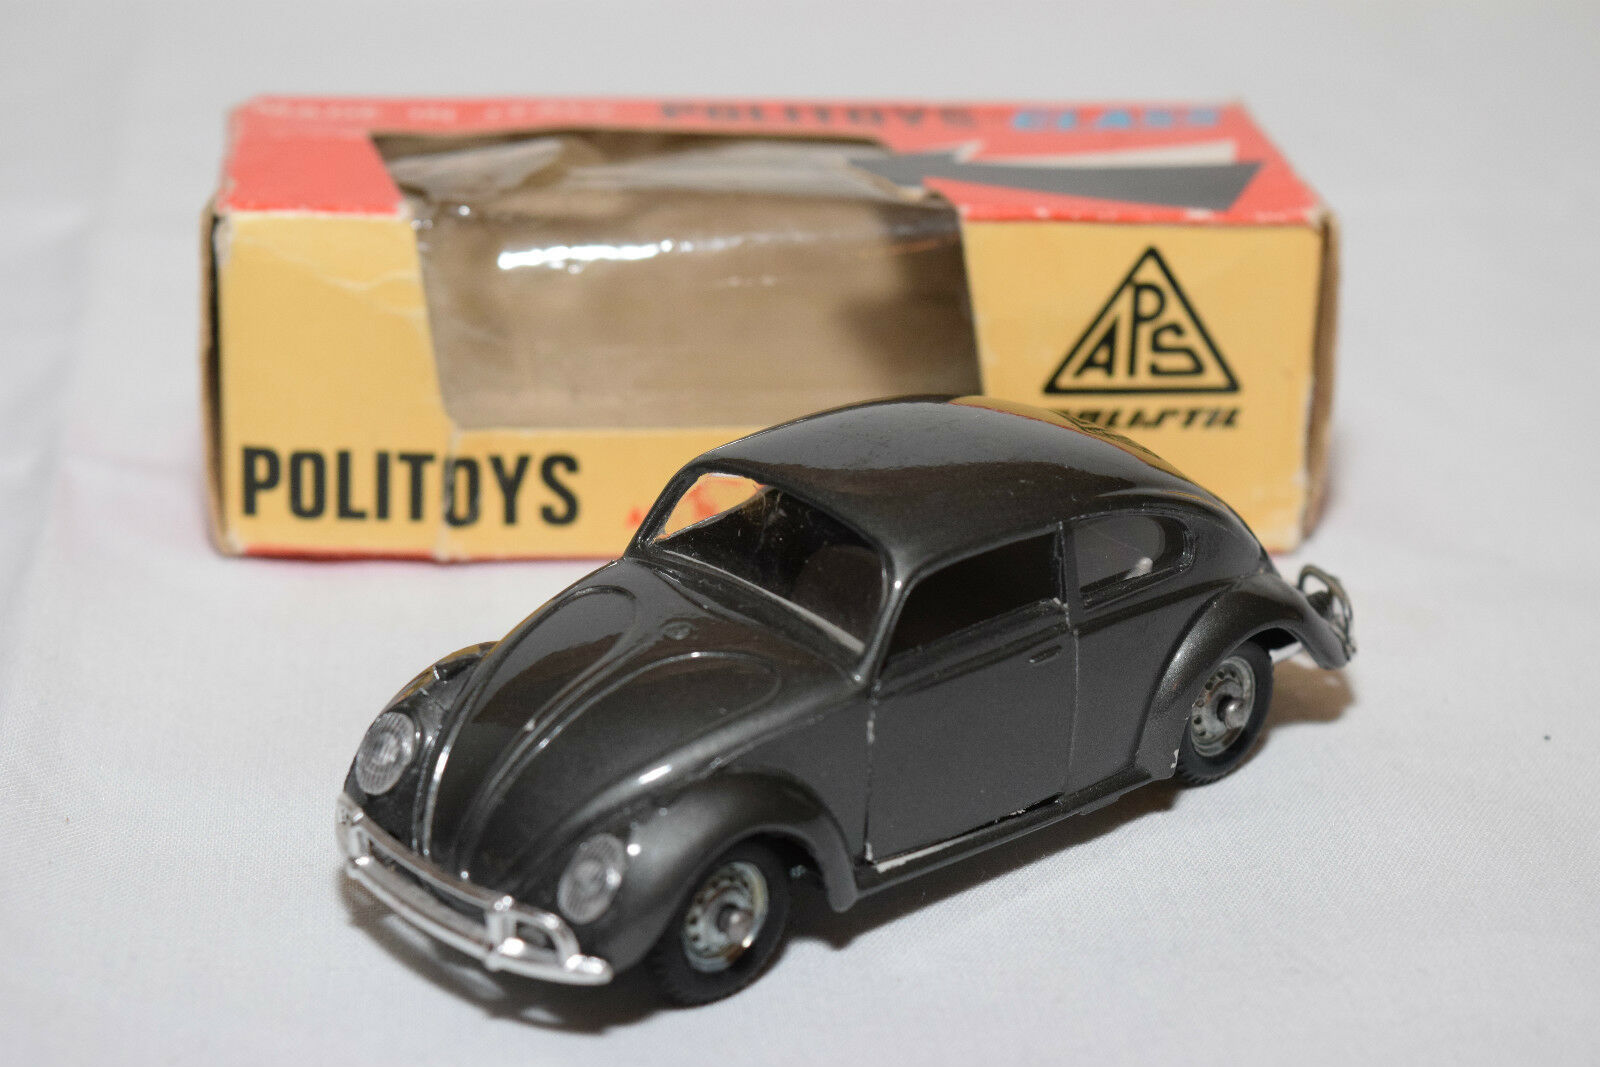 POLITOYS FIBREGLASS N84 N 84 84 84 N.84 VW VOLKSWAGEN 1200 BEETLE KAFER N MINT BOXED eb9b48